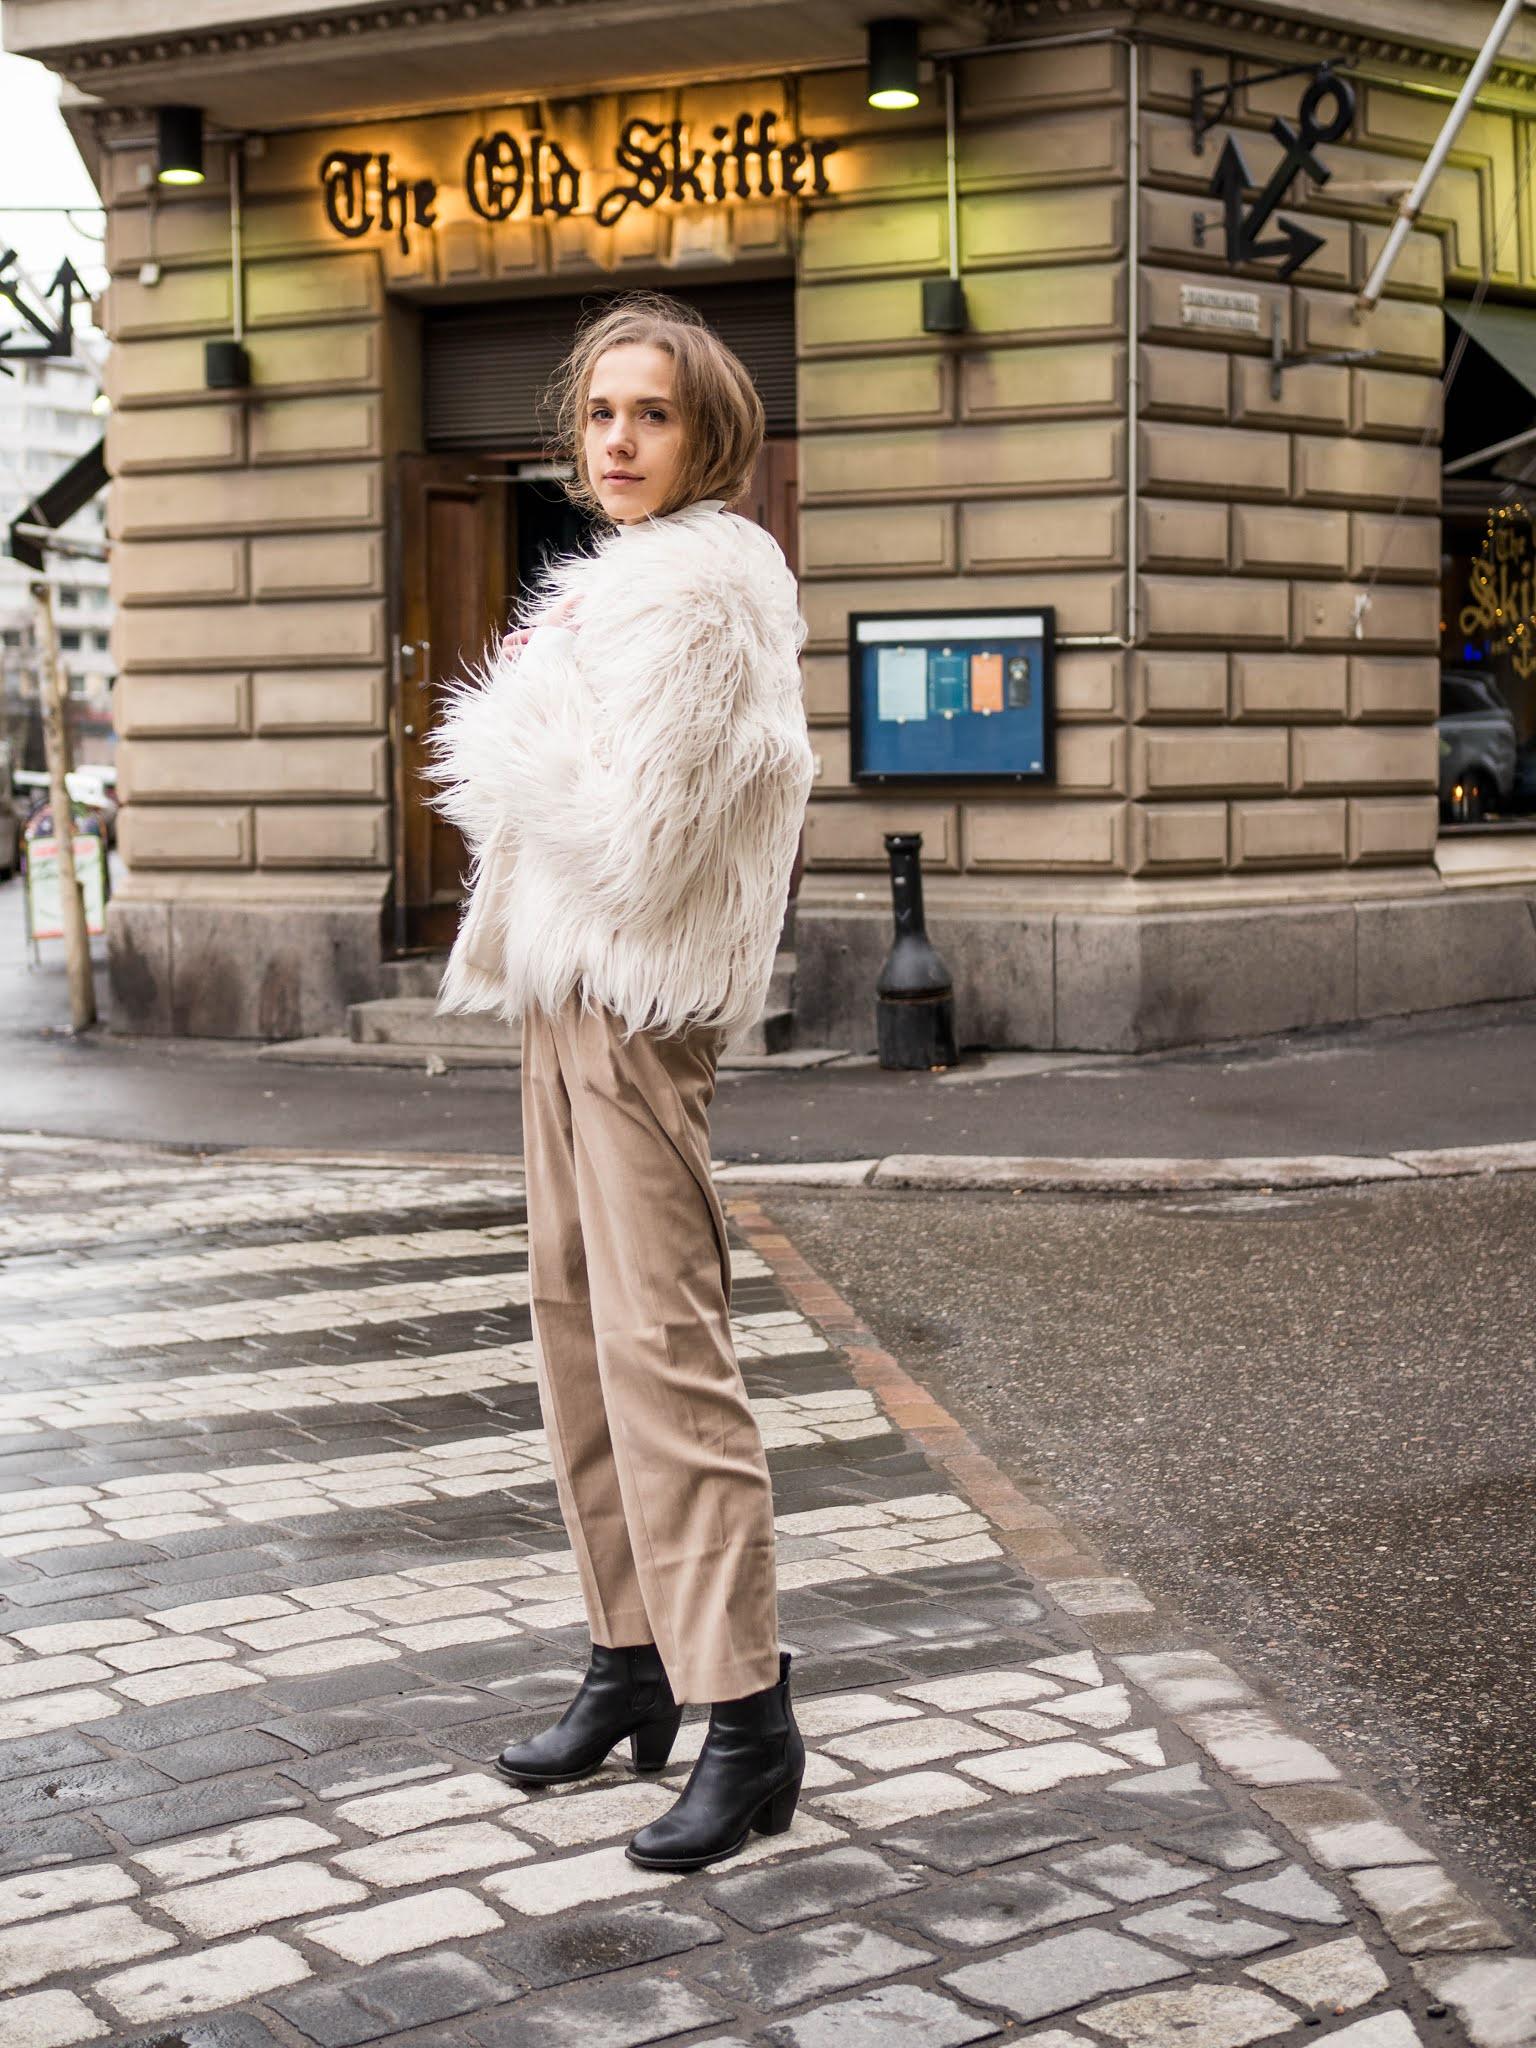 Zadaa-app, valkoinen karvatakki // Zadaa-app, white faux fur coat